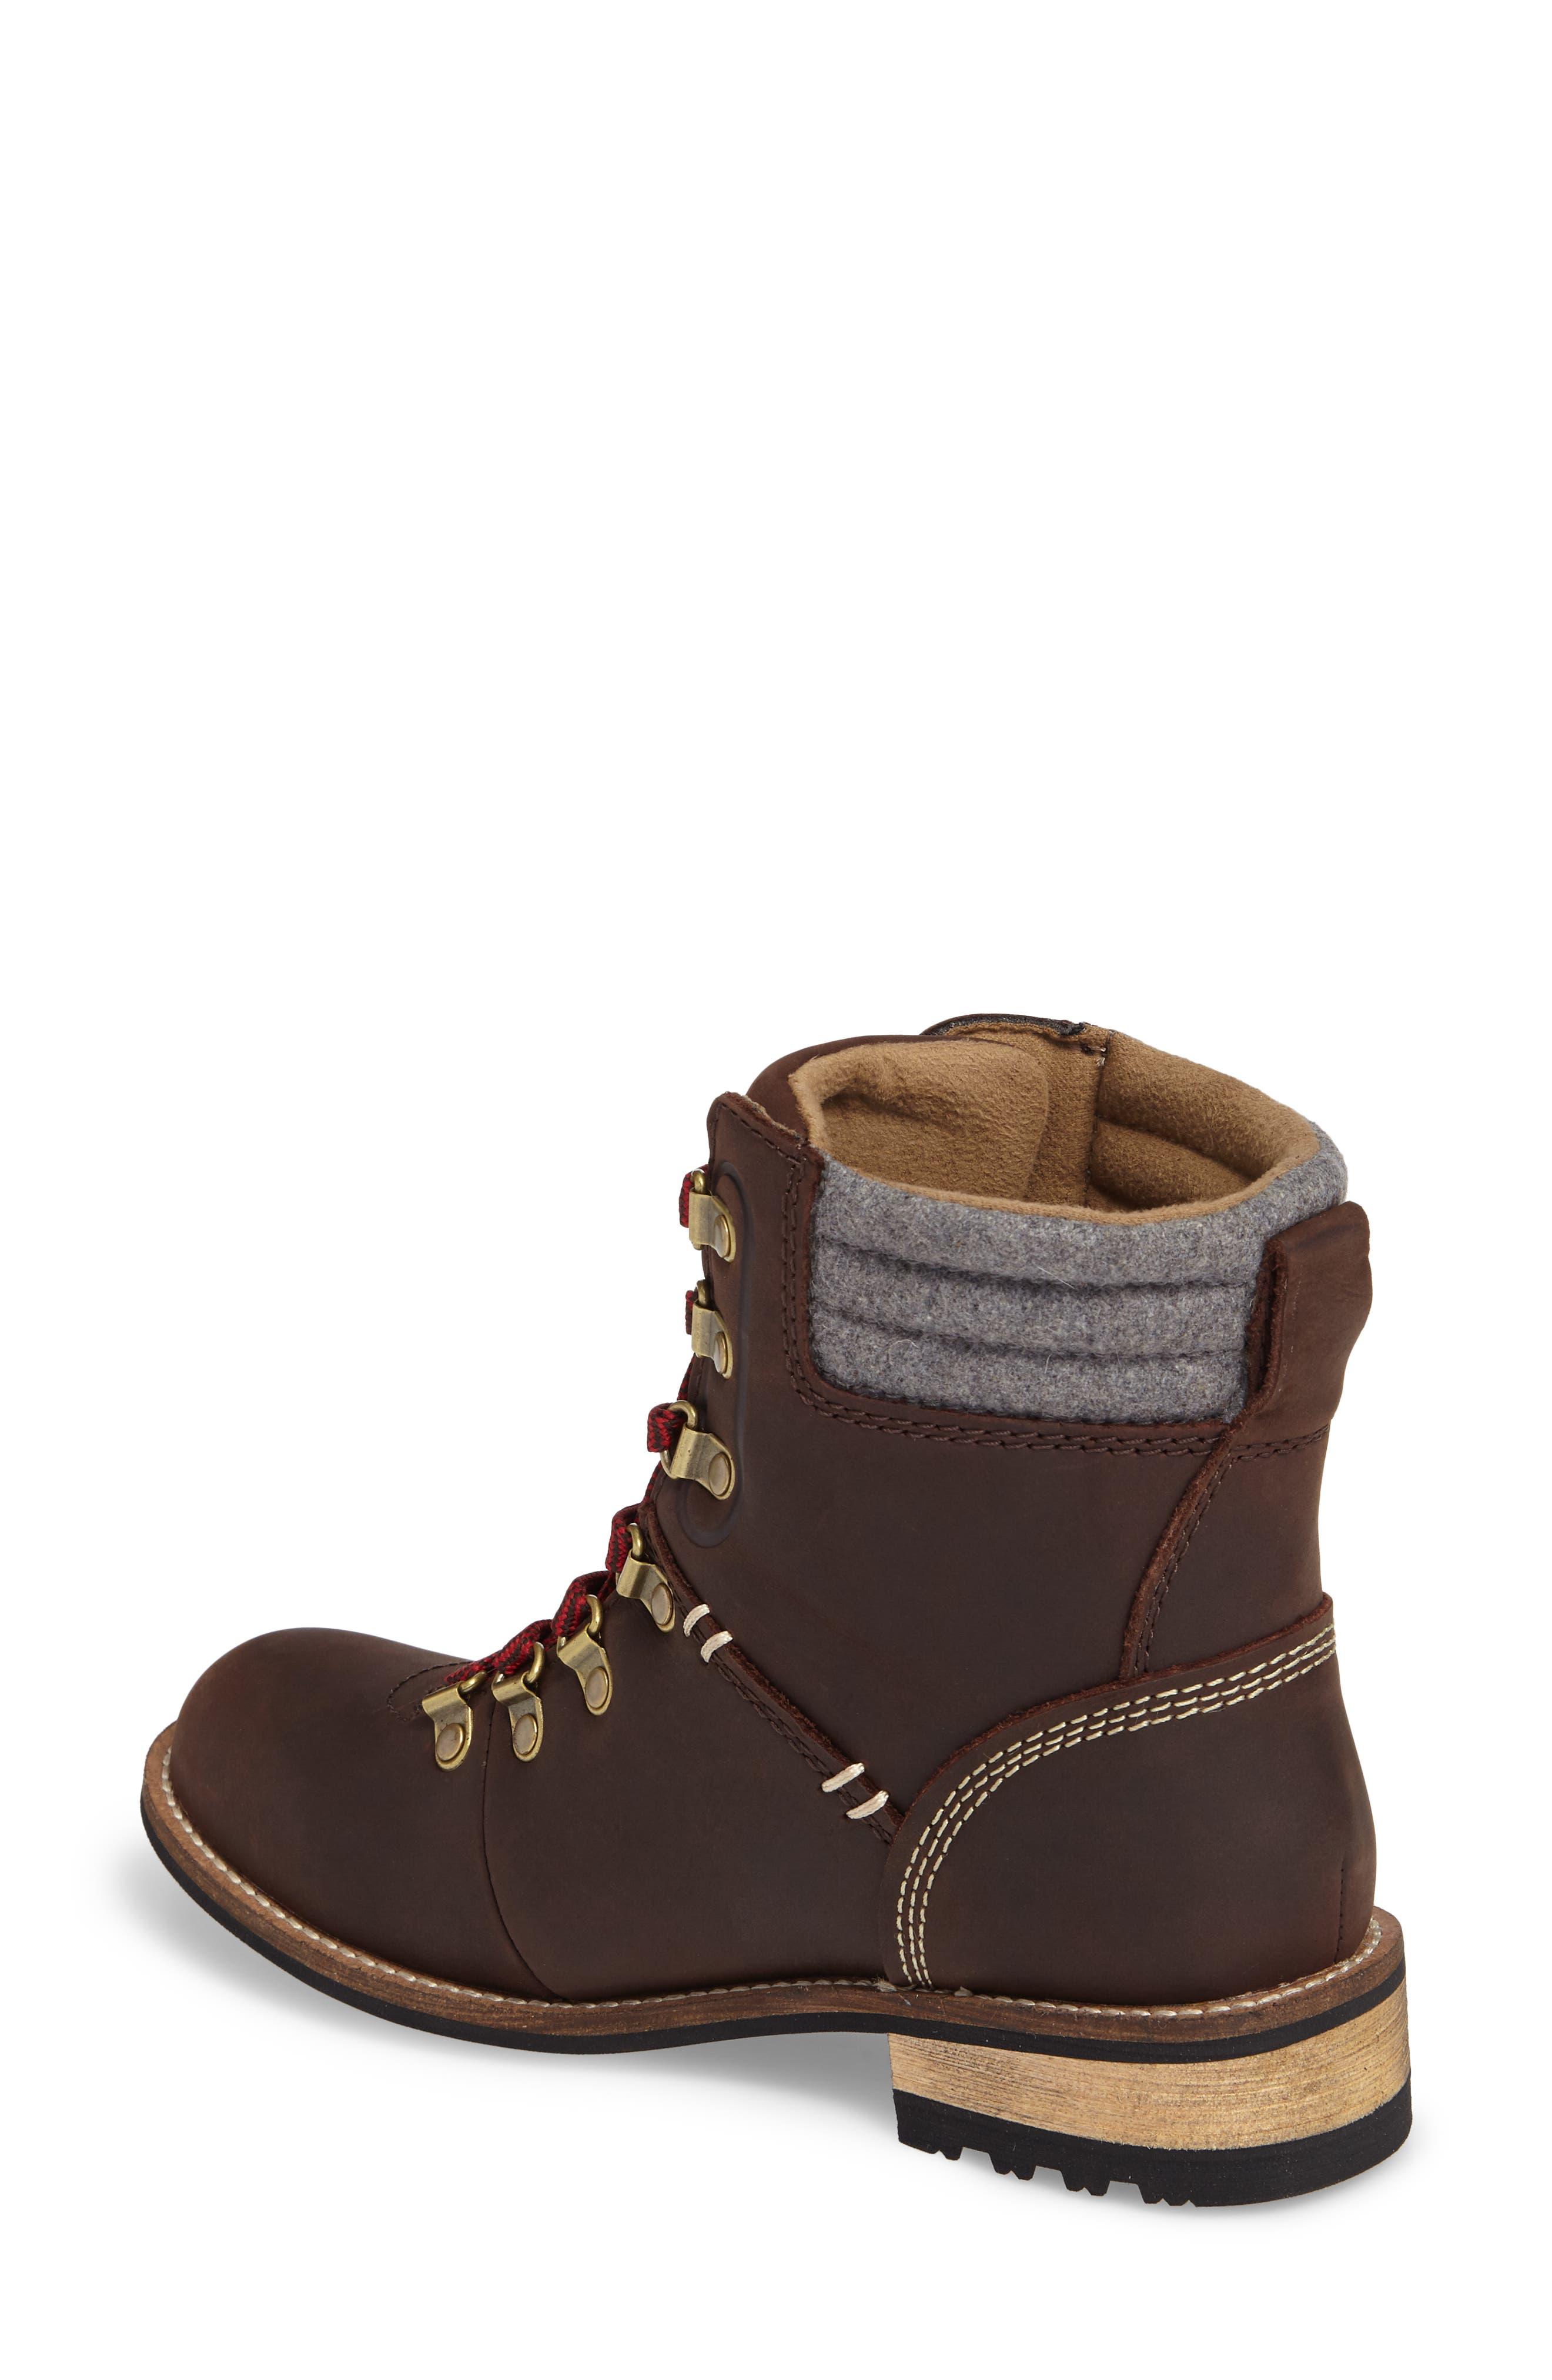 Surrey II Waterproof Boot,                             Alternate thumbnail 2, color,                             Brown Leather